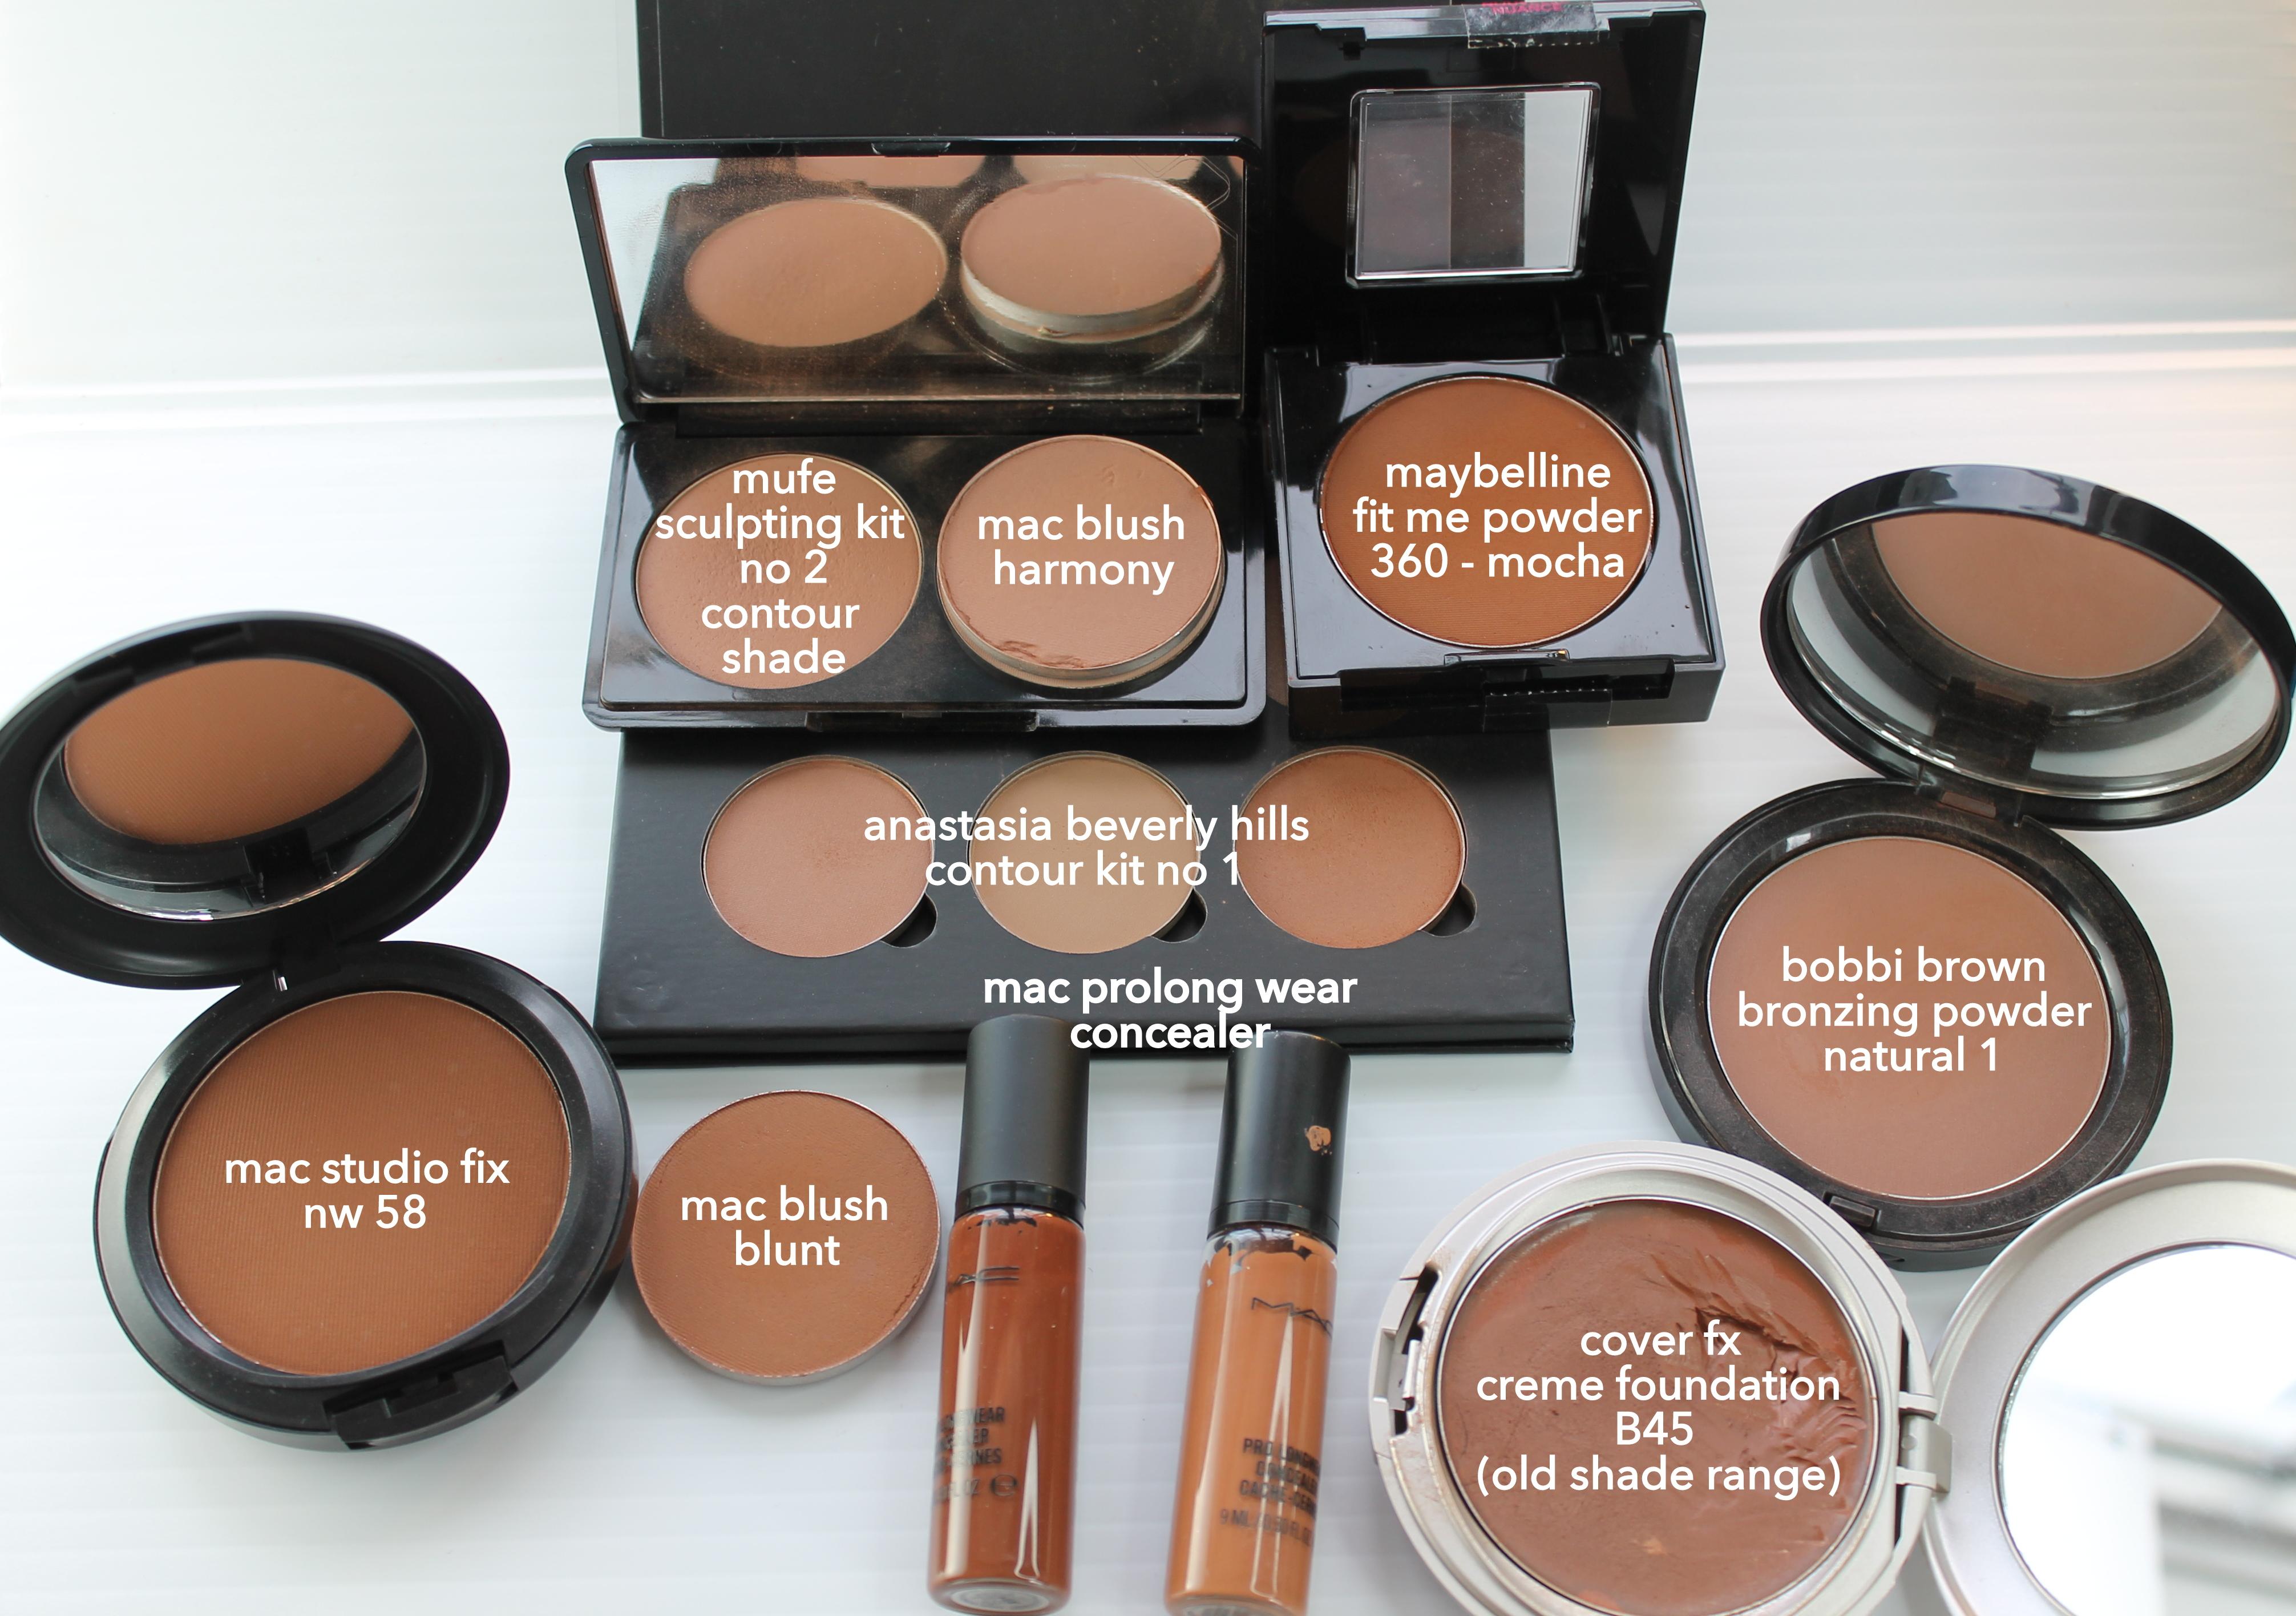 Wedding Makeup Wednesday: Contour, Highlight & Blush   Beauty By Deepti, Makeup Artist and Blog